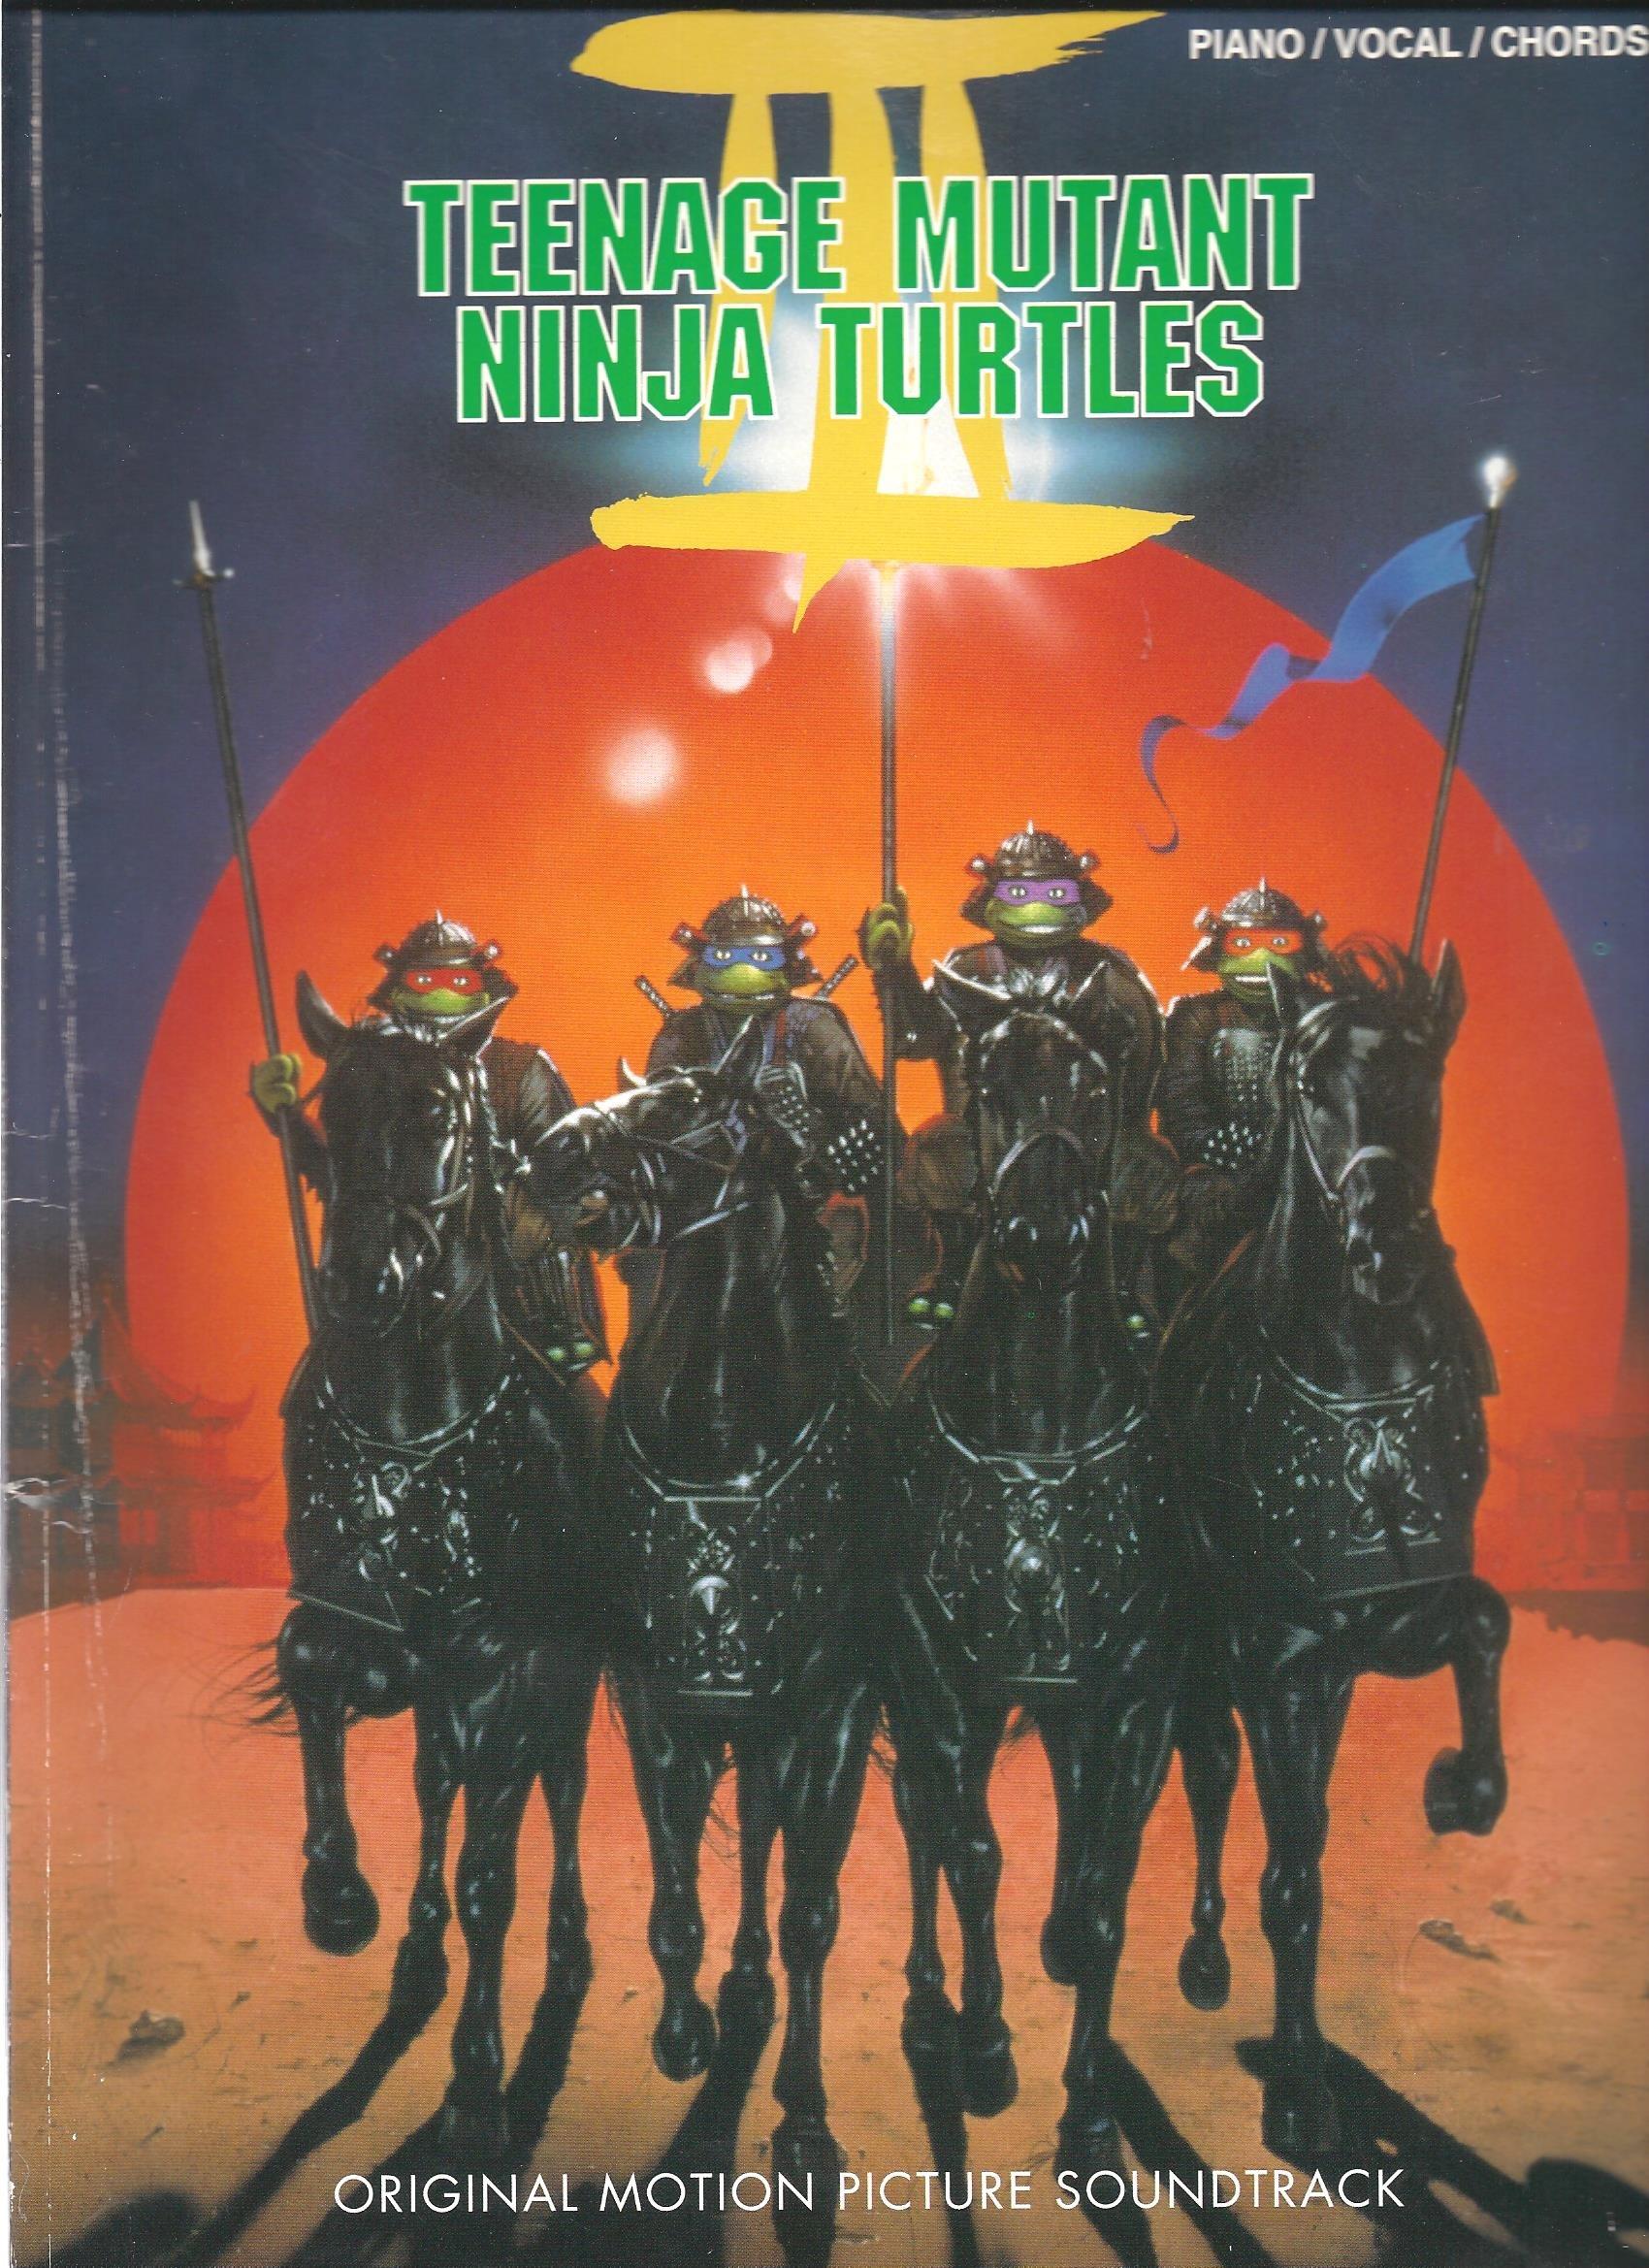 Teenage Mutant Ninja Turtles III (3) Piano/Vocal/Chords ...